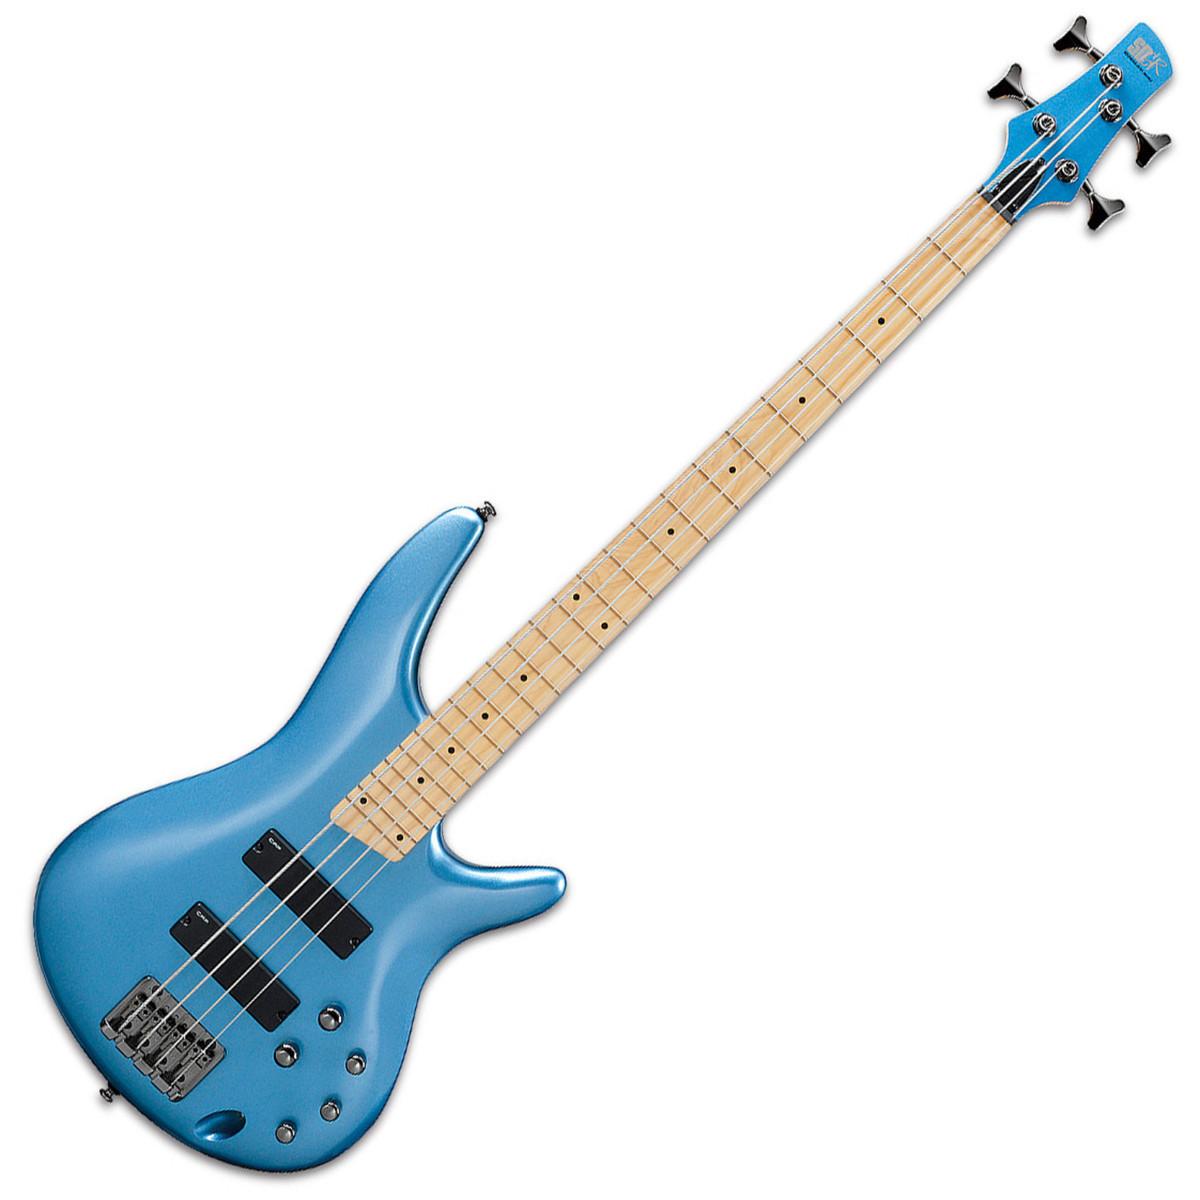 ibanez sr300m bass guitar soda blue ex demo at gear4music. Black Bedroom Furniture Sets. Home Design Ideas